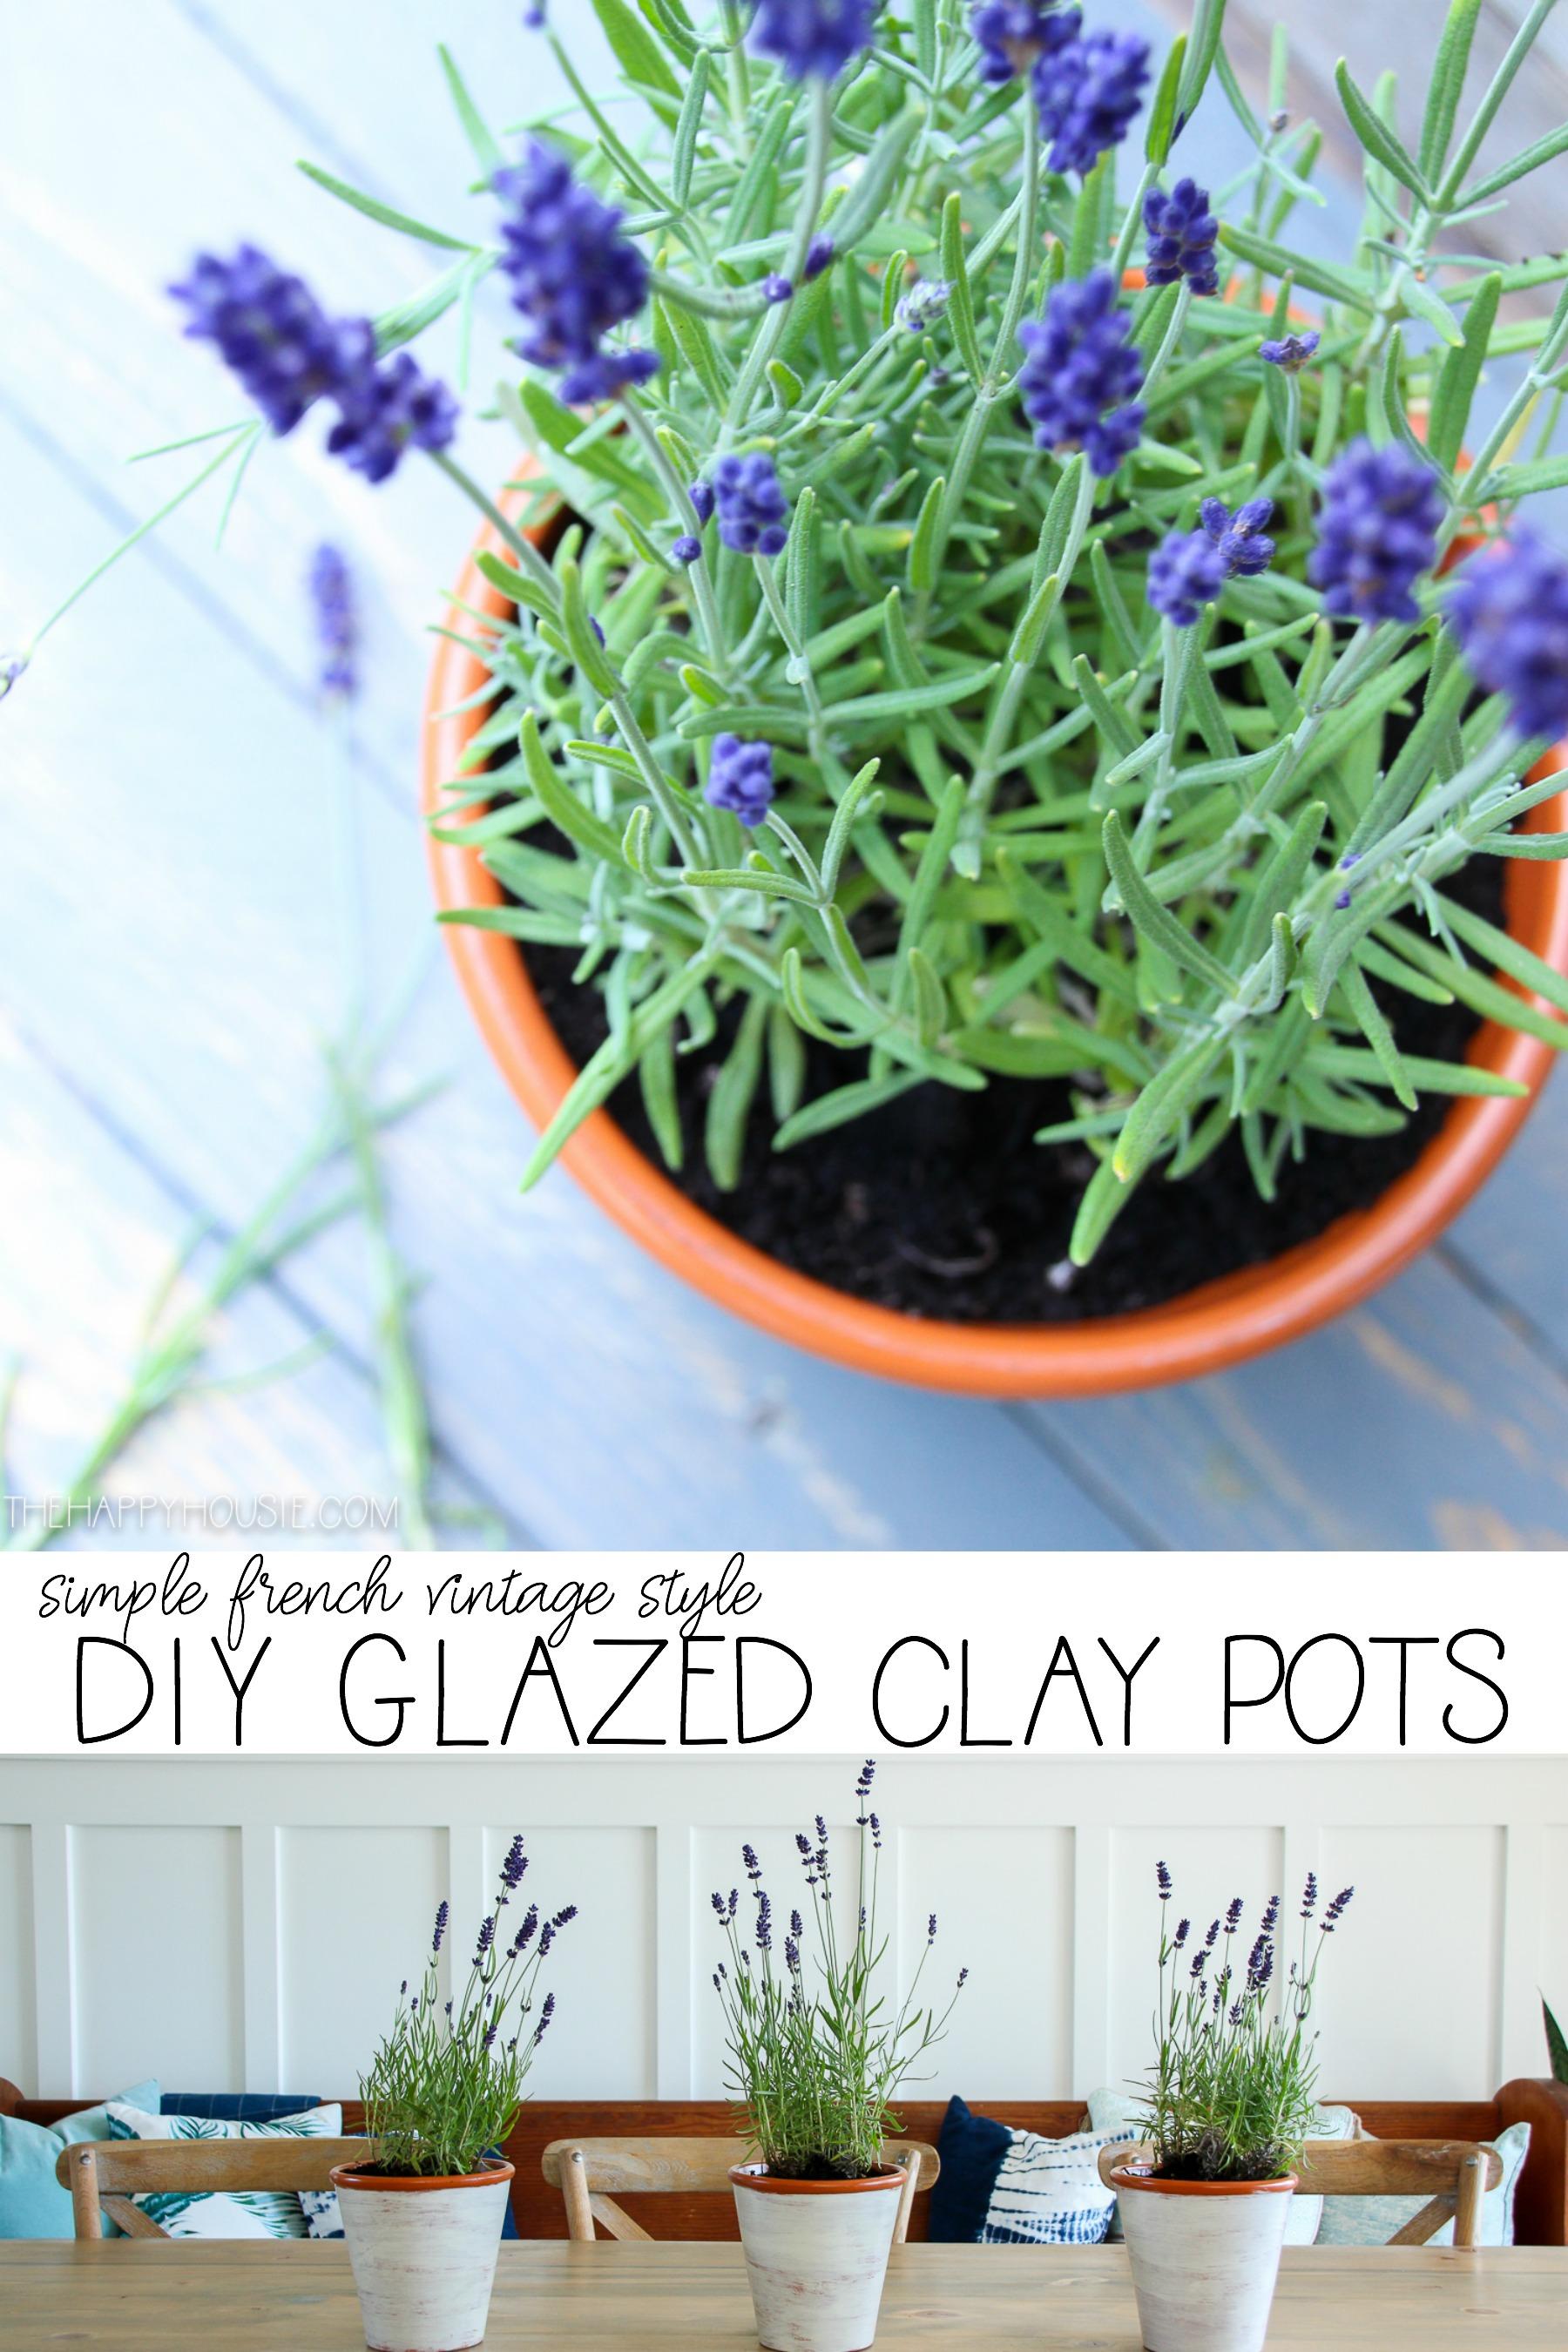 DIY Glazed Clay Pots graphic.